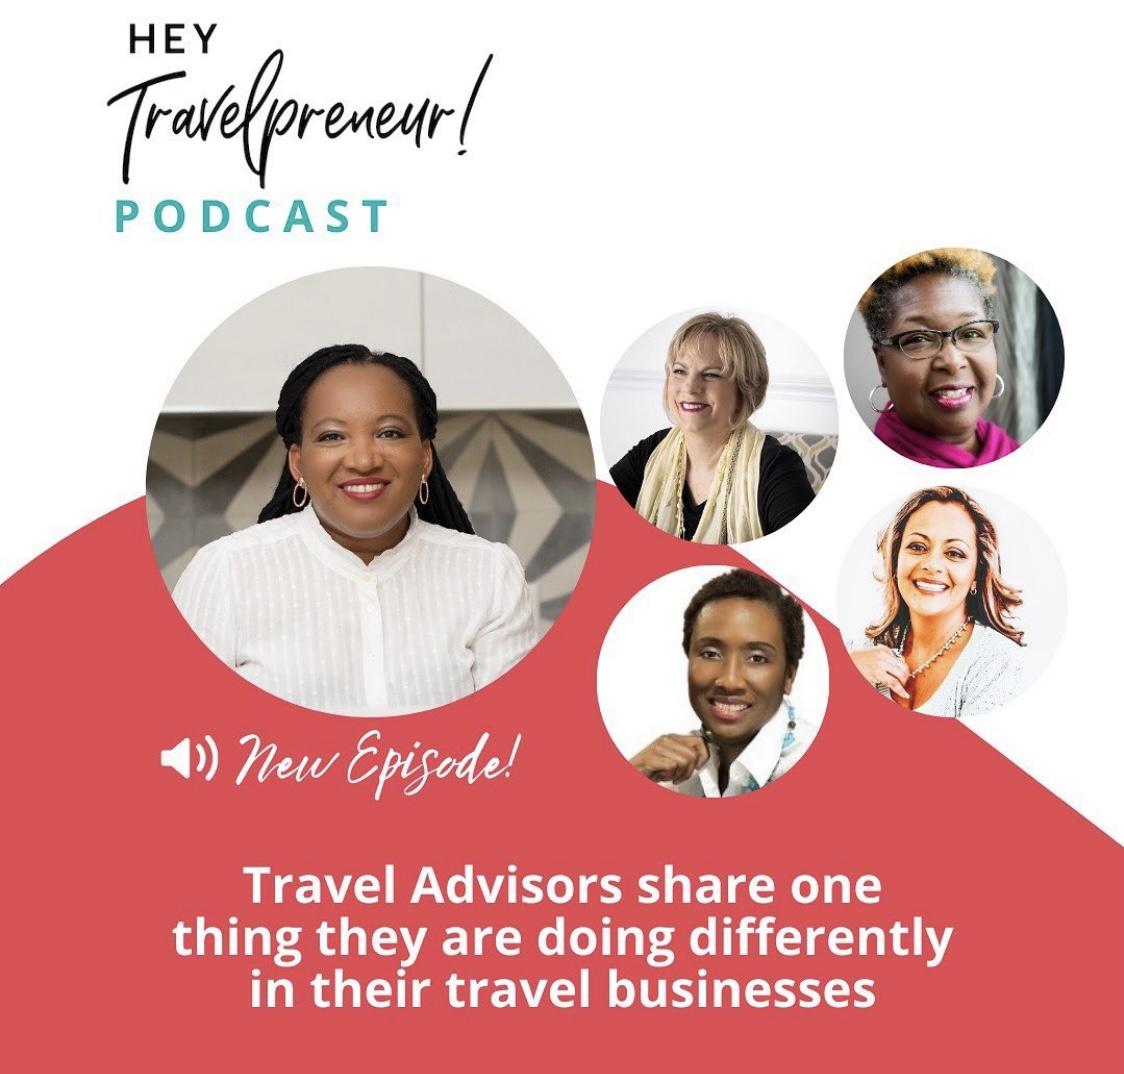 SelfishMe Travel on Hey Travelpreneur! podcast with Nicole Barrett